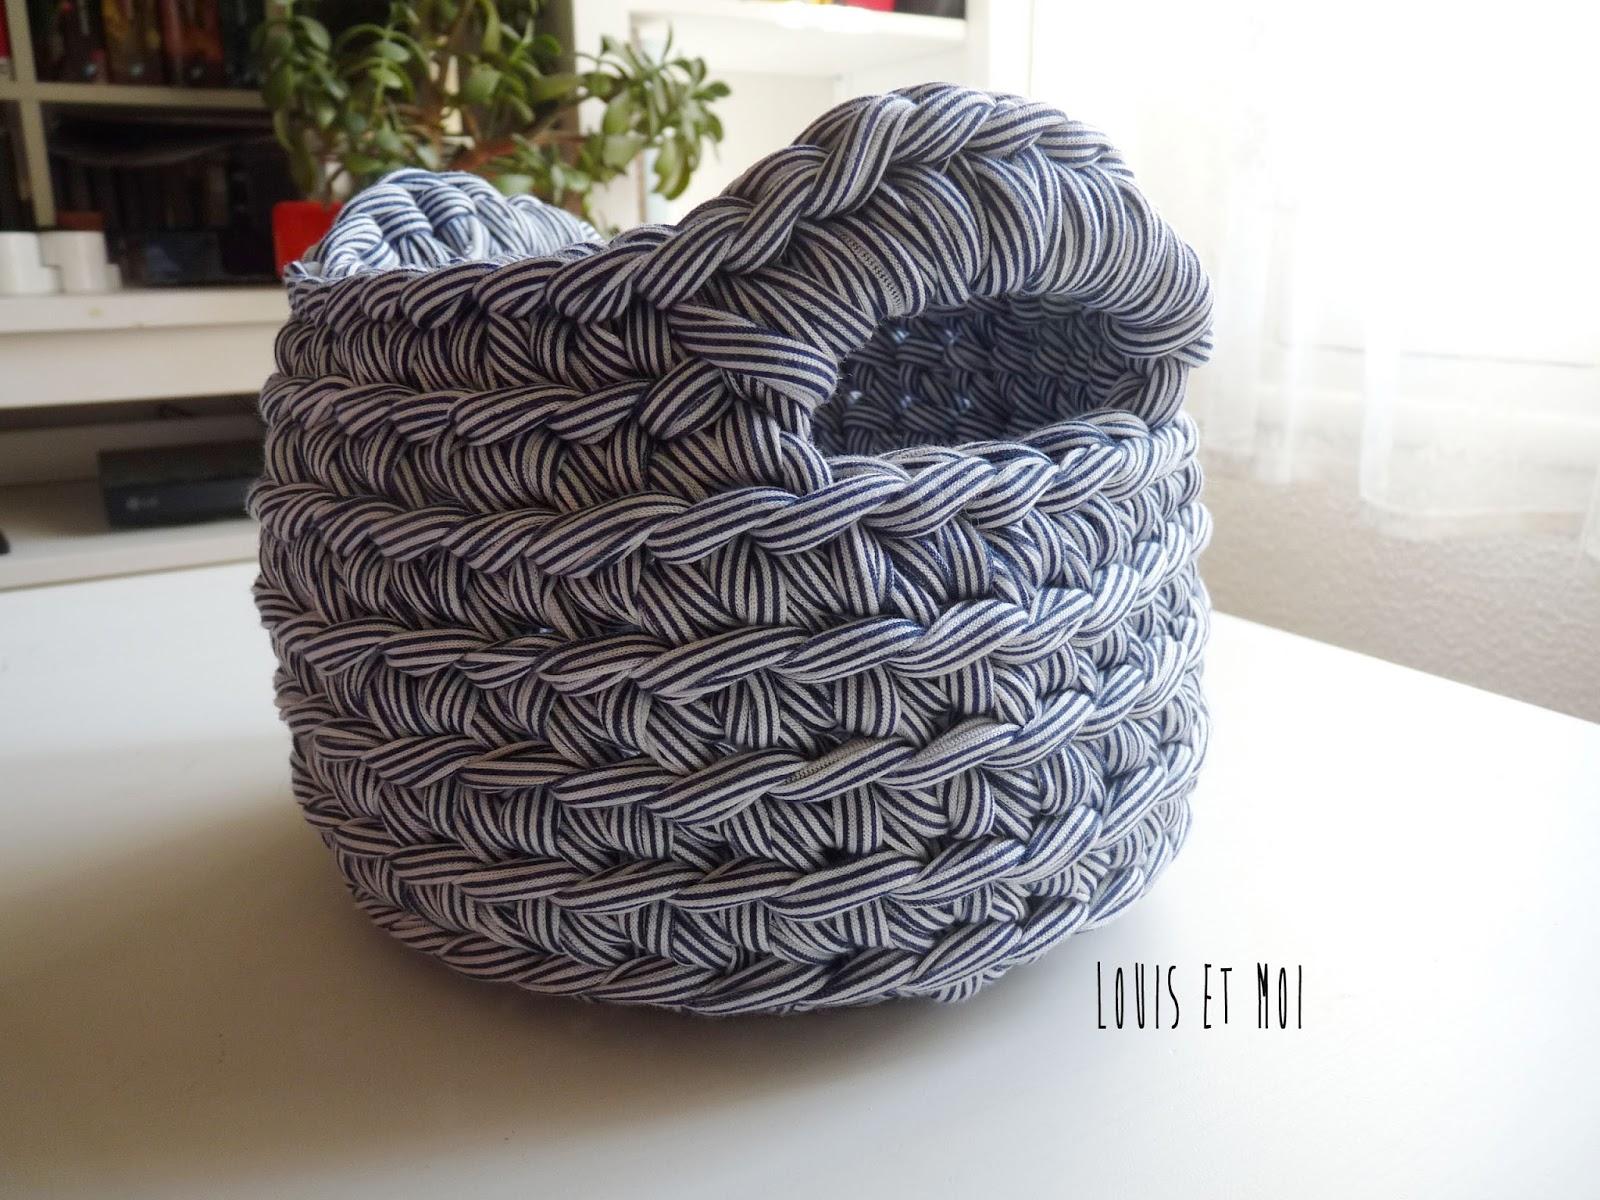 Louis et moi cosen y hacen crochet patr n de cestita en - Cestas de ganchillo ...